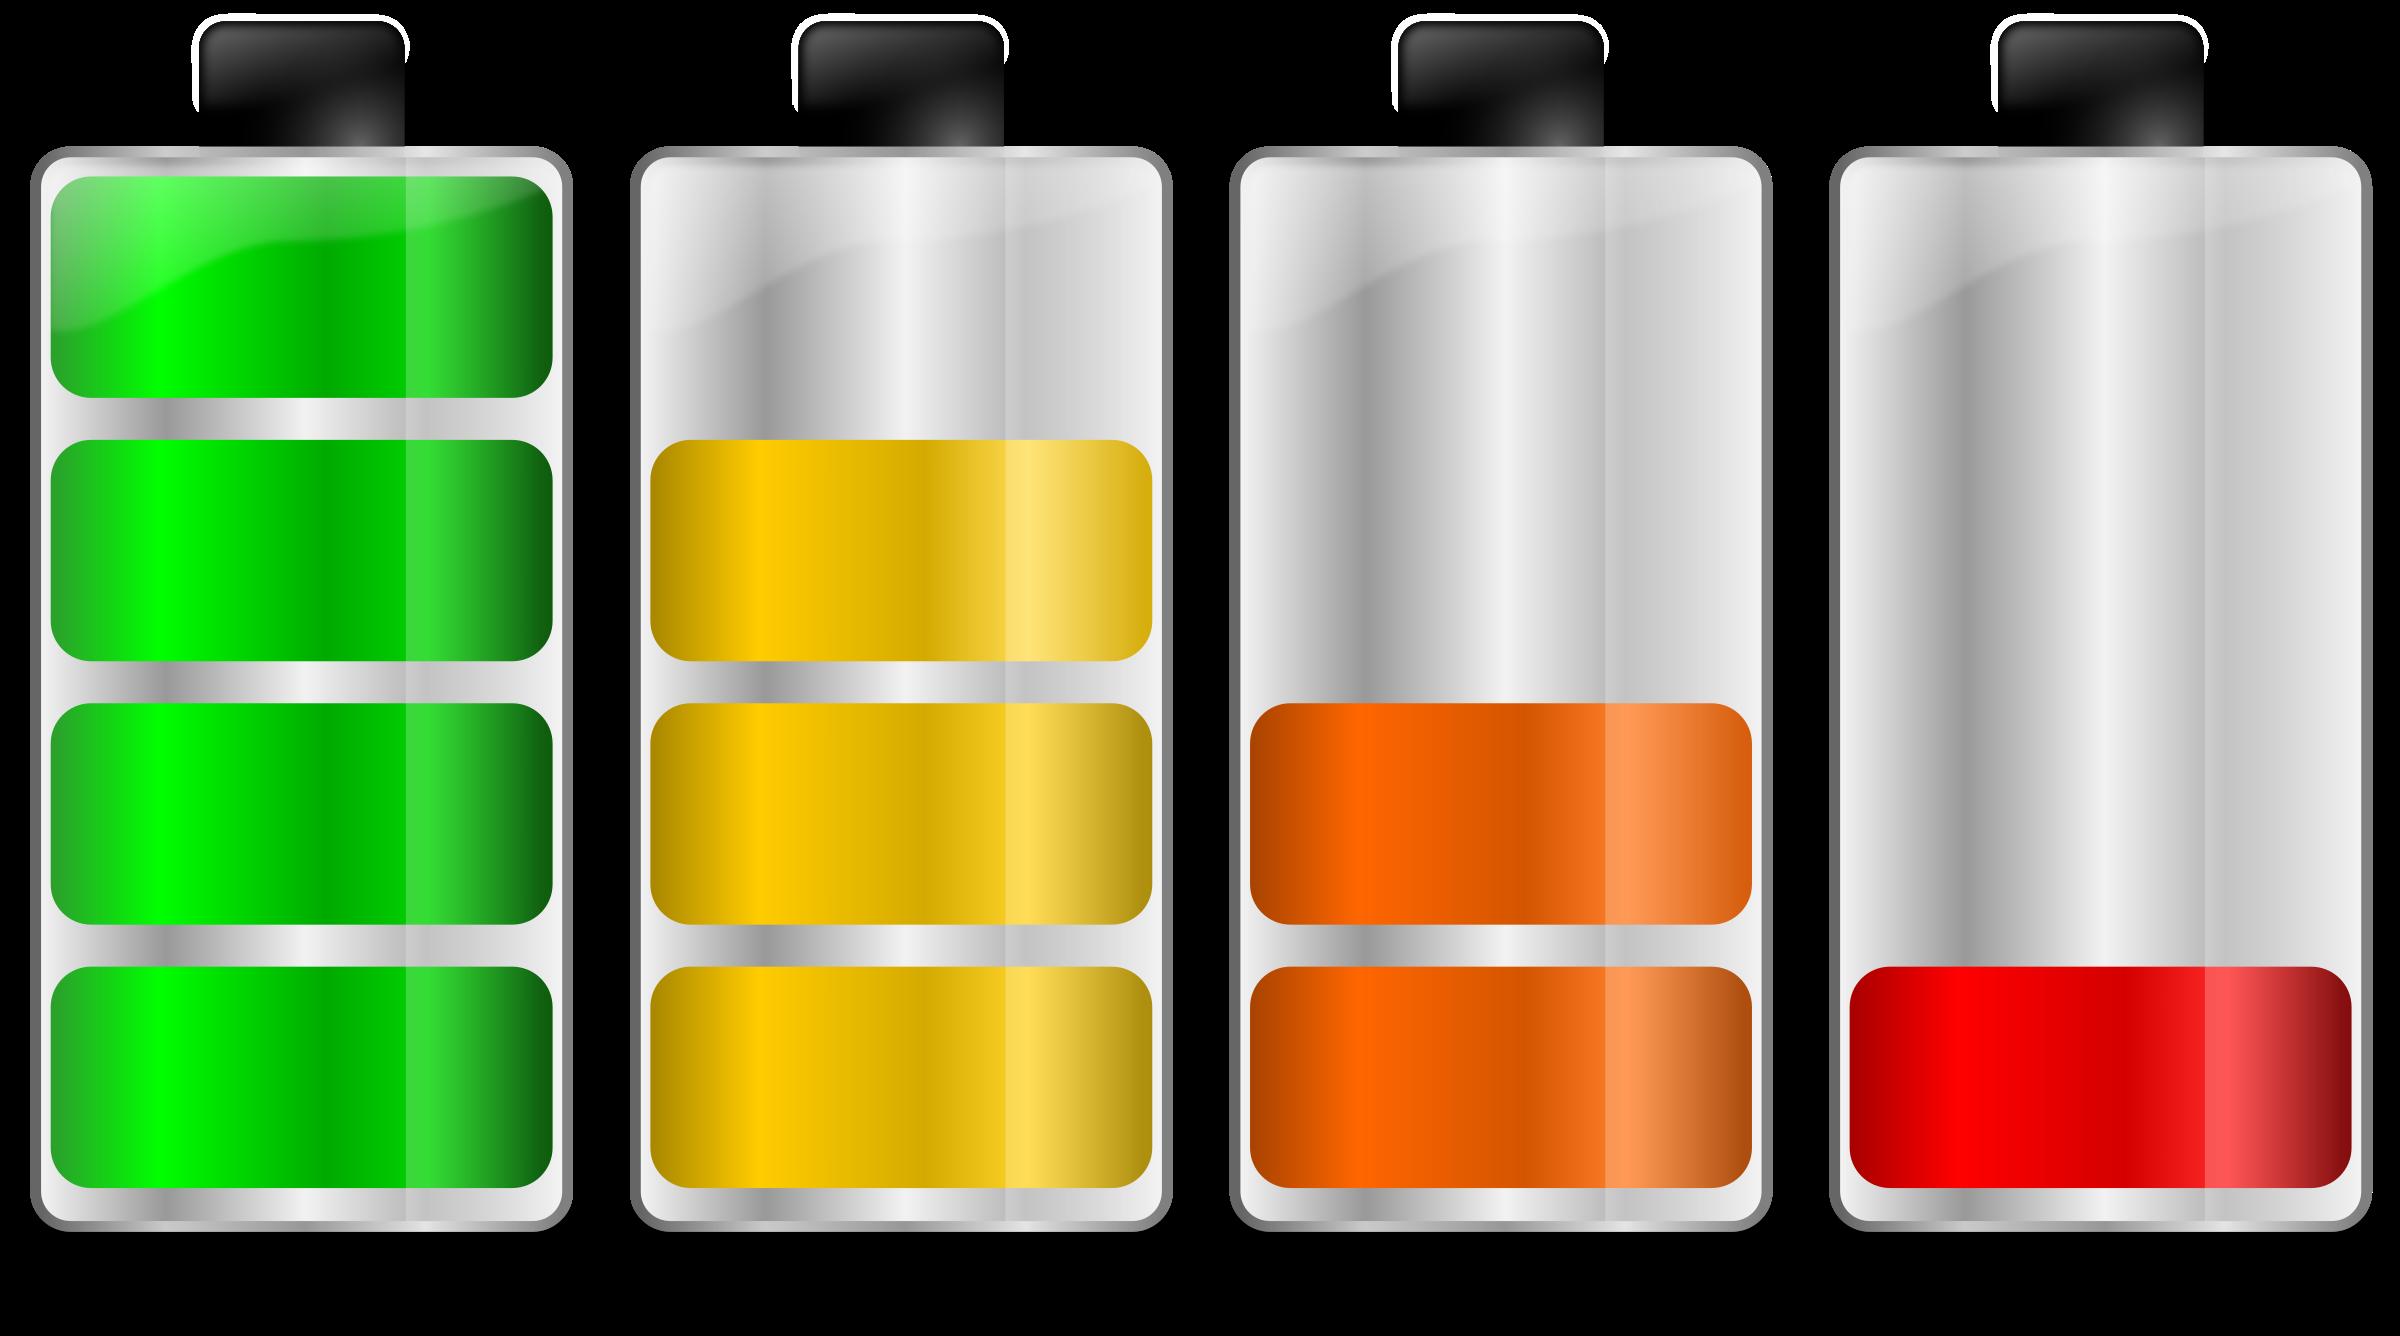 clipart battery levels niveles de carga de bater u00c3 u00ada microsoft office free clip art bible microsoft office free clip art downloads